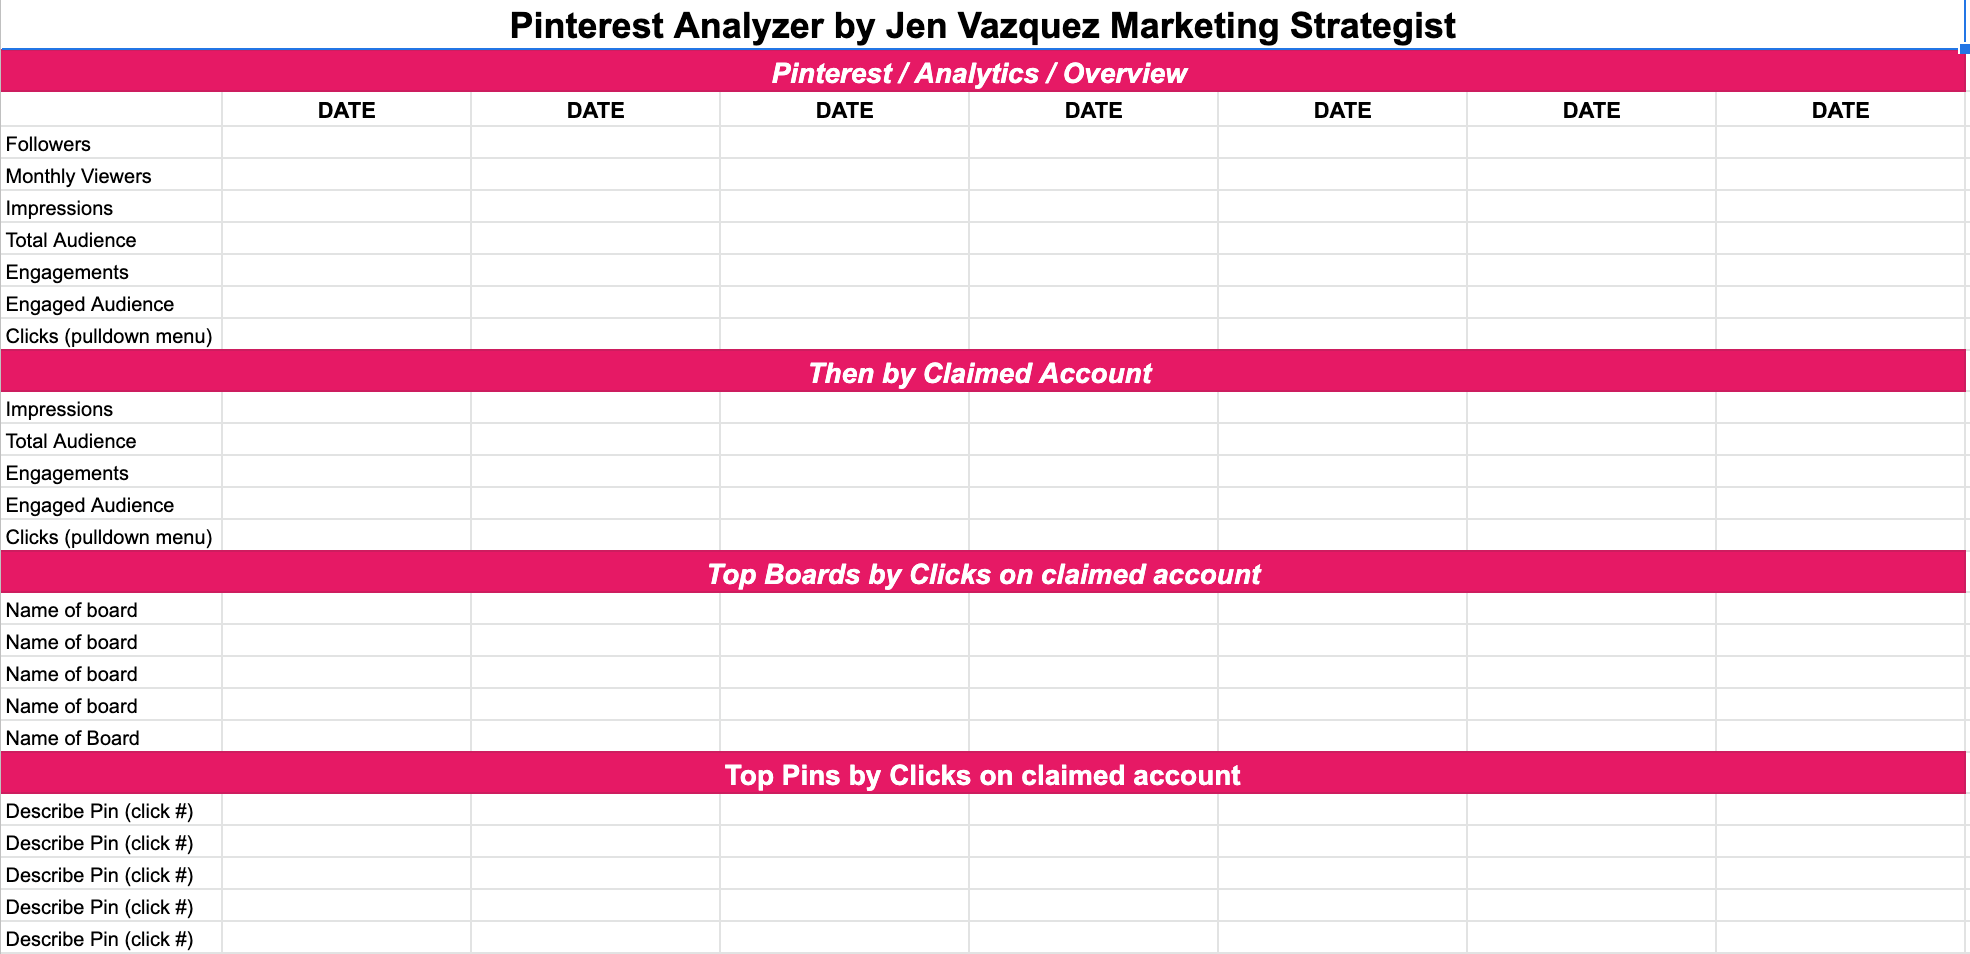 Pinterest Analyzer from Jen vazquez Photography to measure analytics from Pinterest